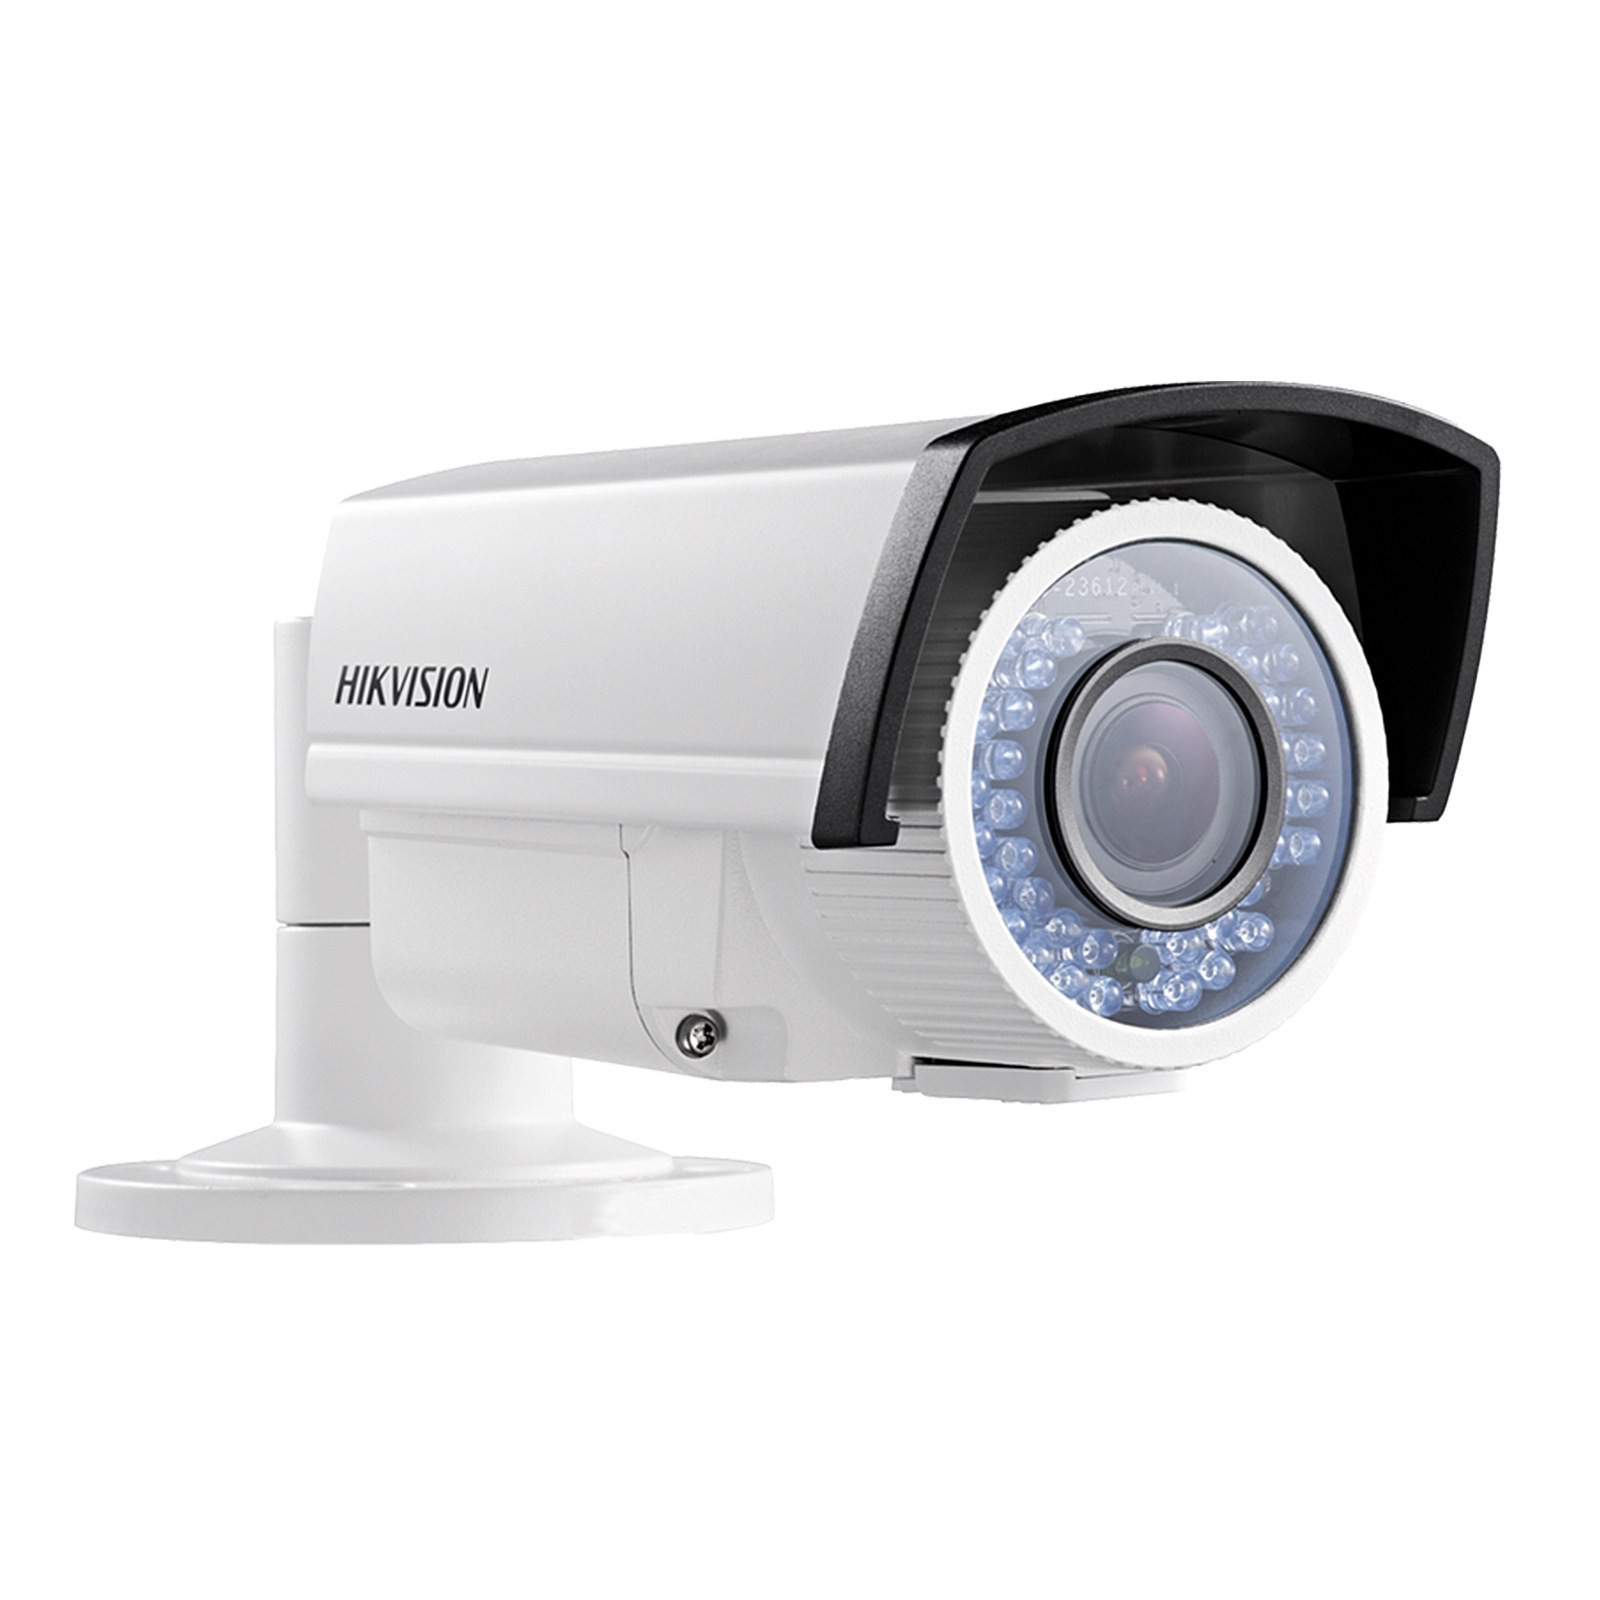 Telecamera Varifocale 2.8 - 12mm HIKVISION TURBO HD READY 720P Videosorveglianza